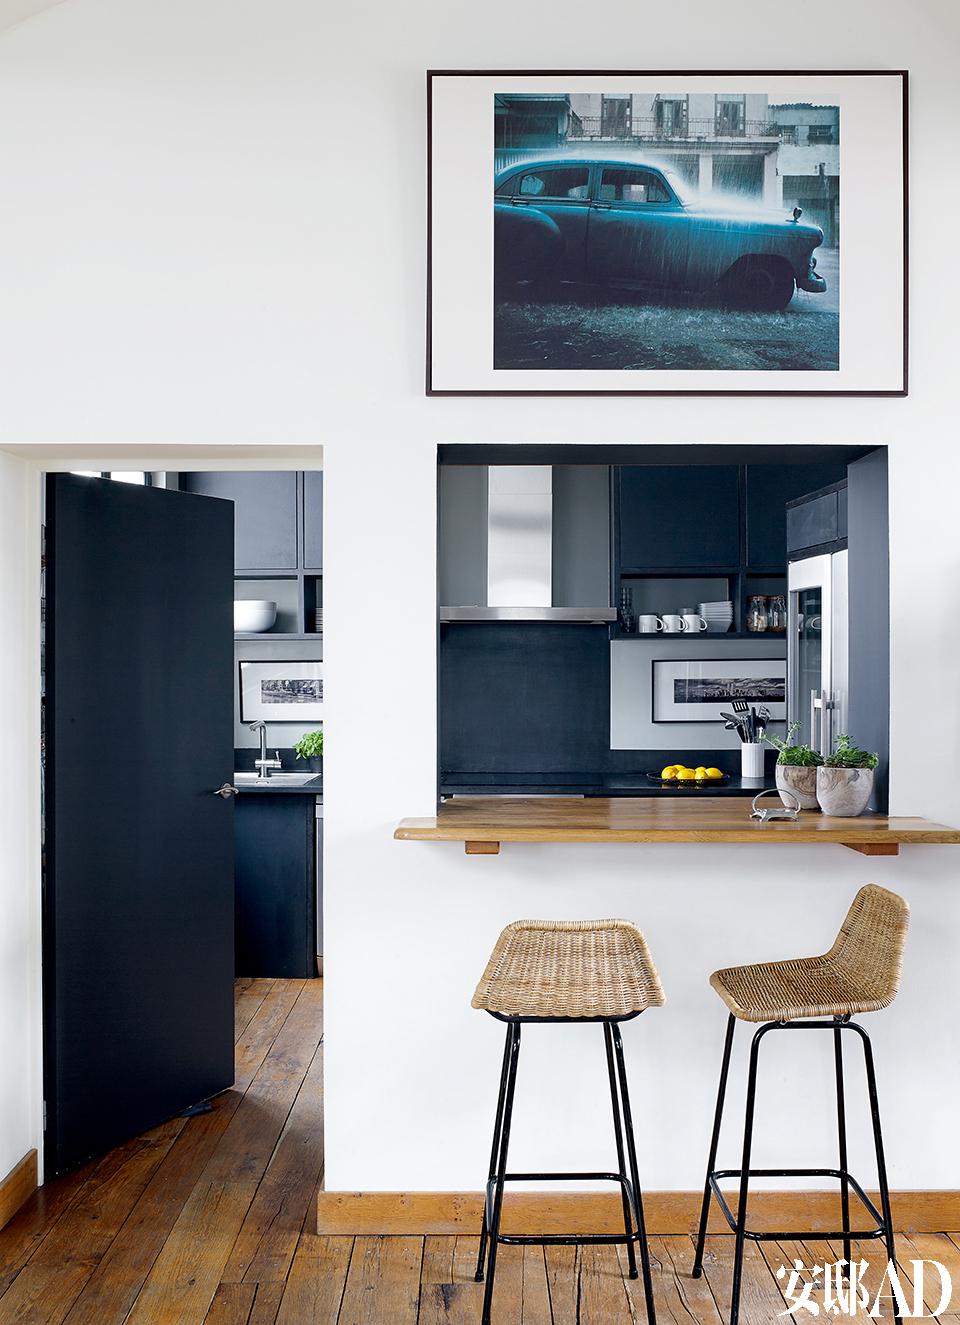 Florence Lopez用吧台的设计 打通了客厅与厨房。藤编高脚凳是Mimbre的古董家具。吧台上方的摄影作品是法国著名摄影师Thierry Le Gouès在哈瓦那拍摄的一系列美国汽车中的一幅。